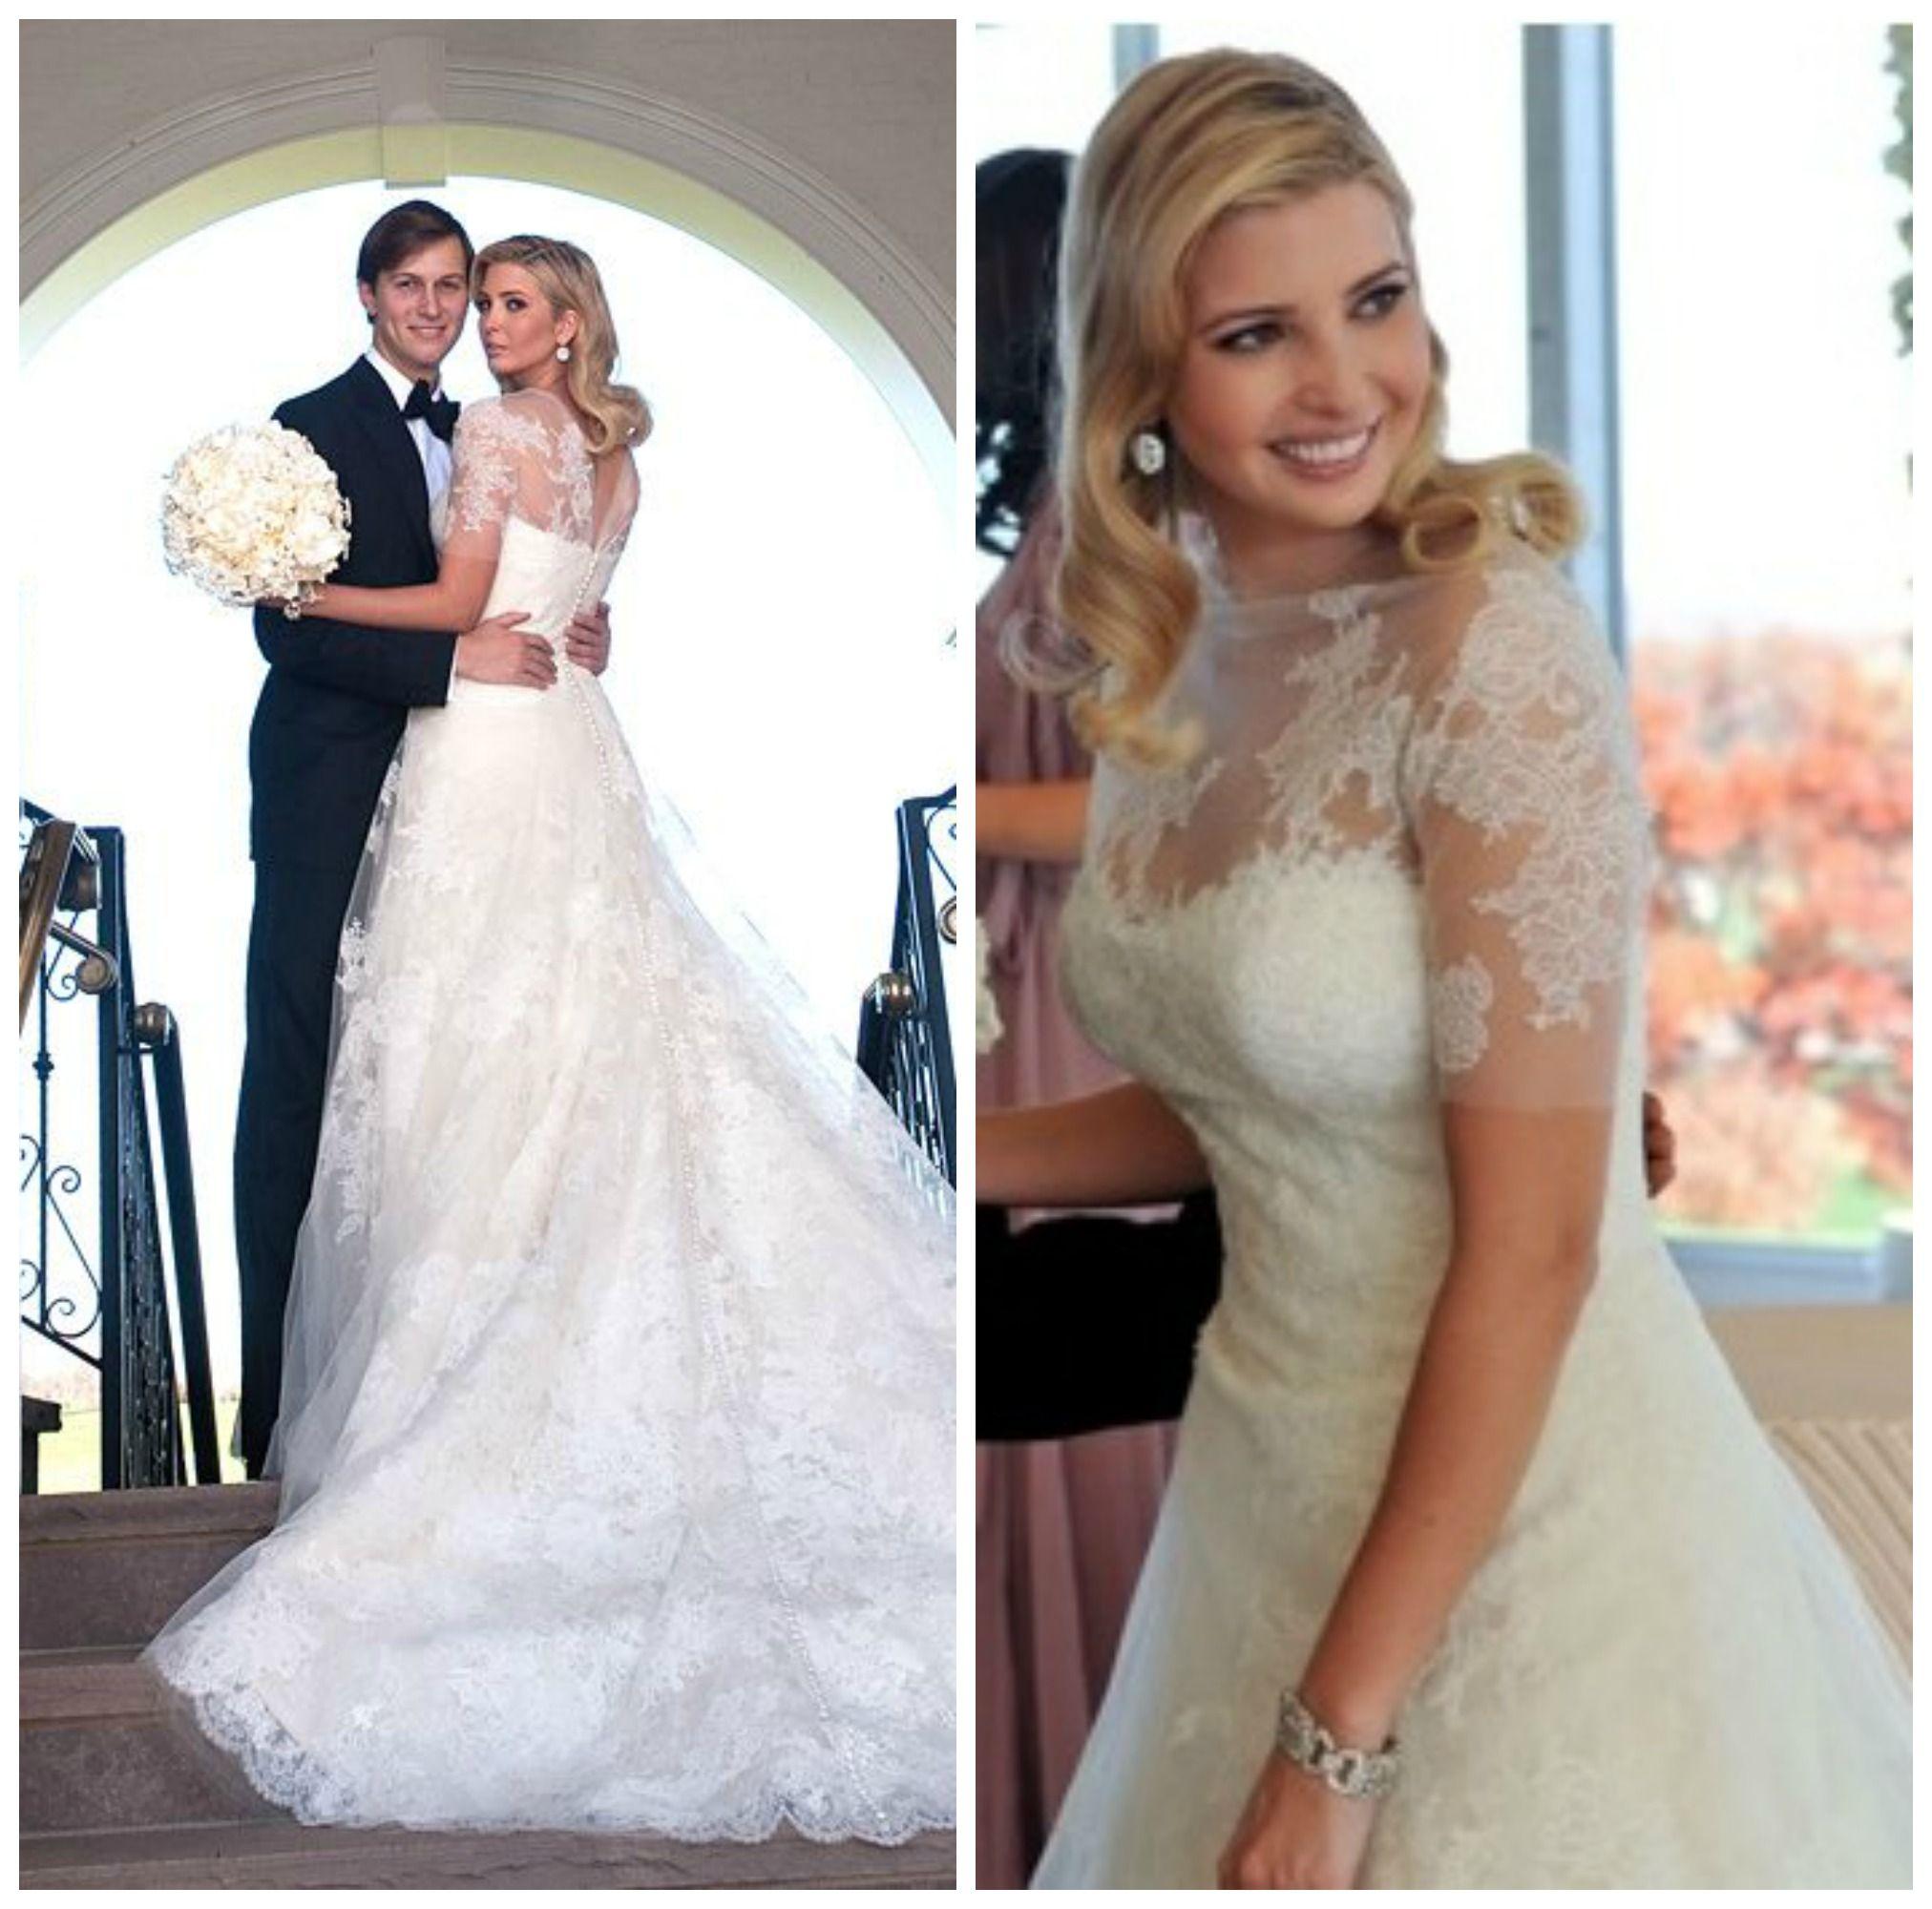 At Her Wedding With Jared Kushner Ivanka Trump Weared Grace Kelly